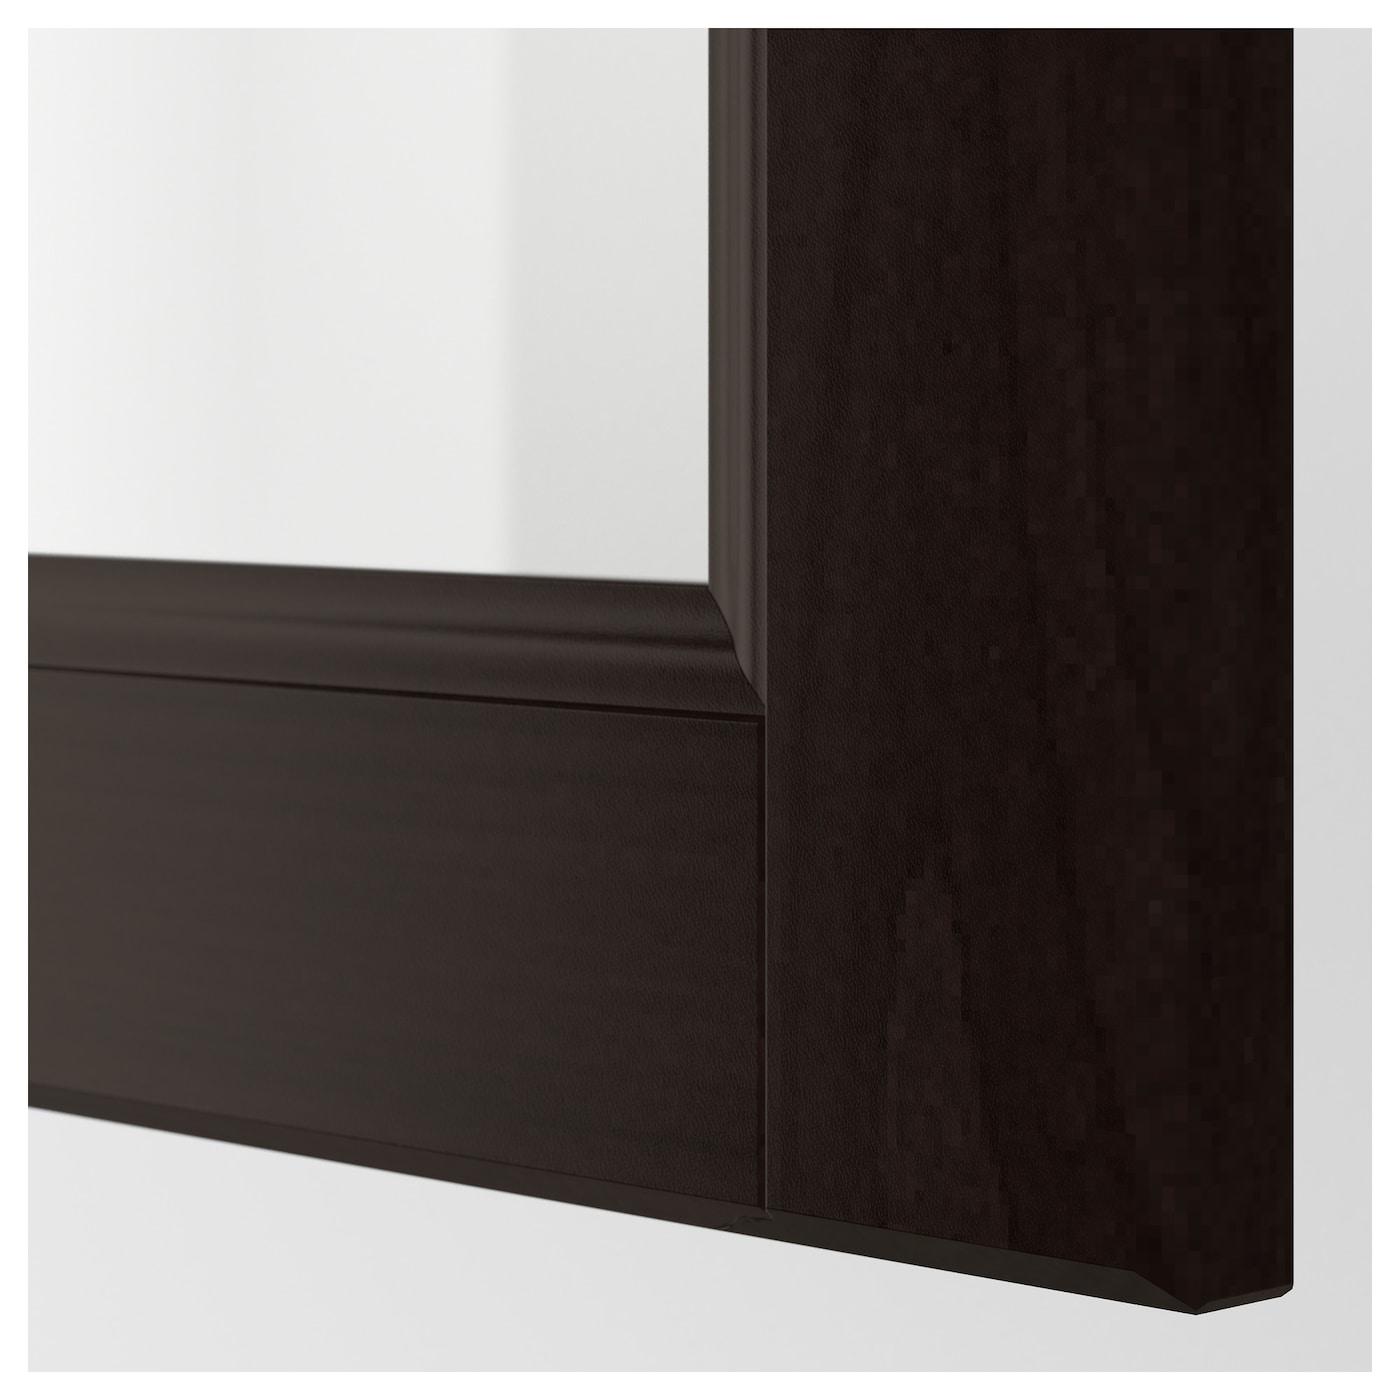 laxarby vitrinedeur zwartbruin 40x80 cm ikea. Black Bedroom Furniture Sets. Home Design Ideas